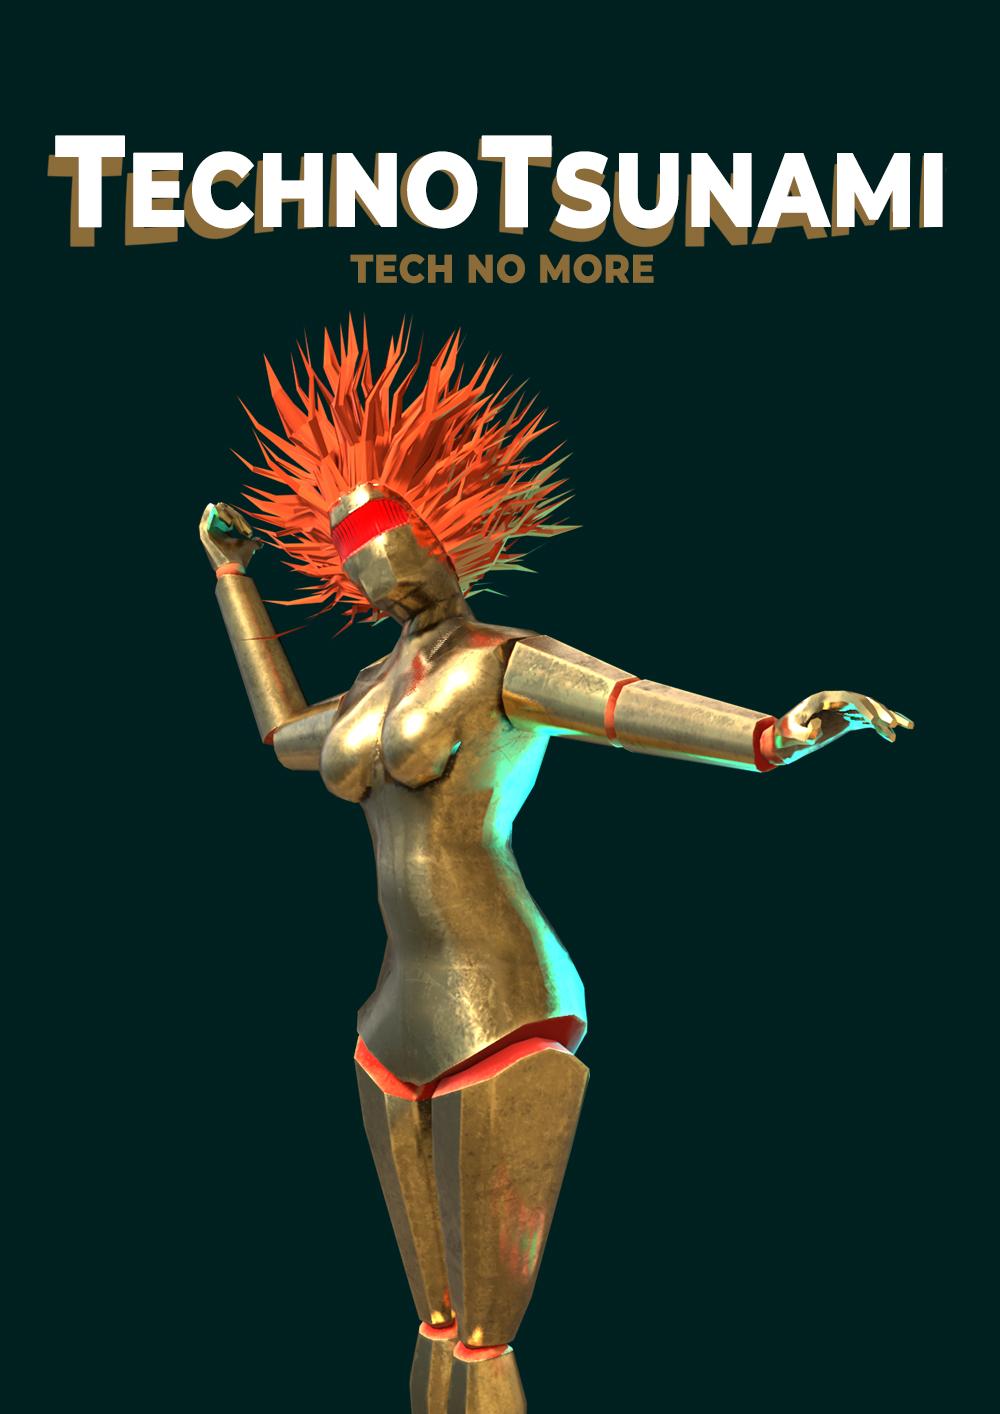 TechnoTsunami Poster